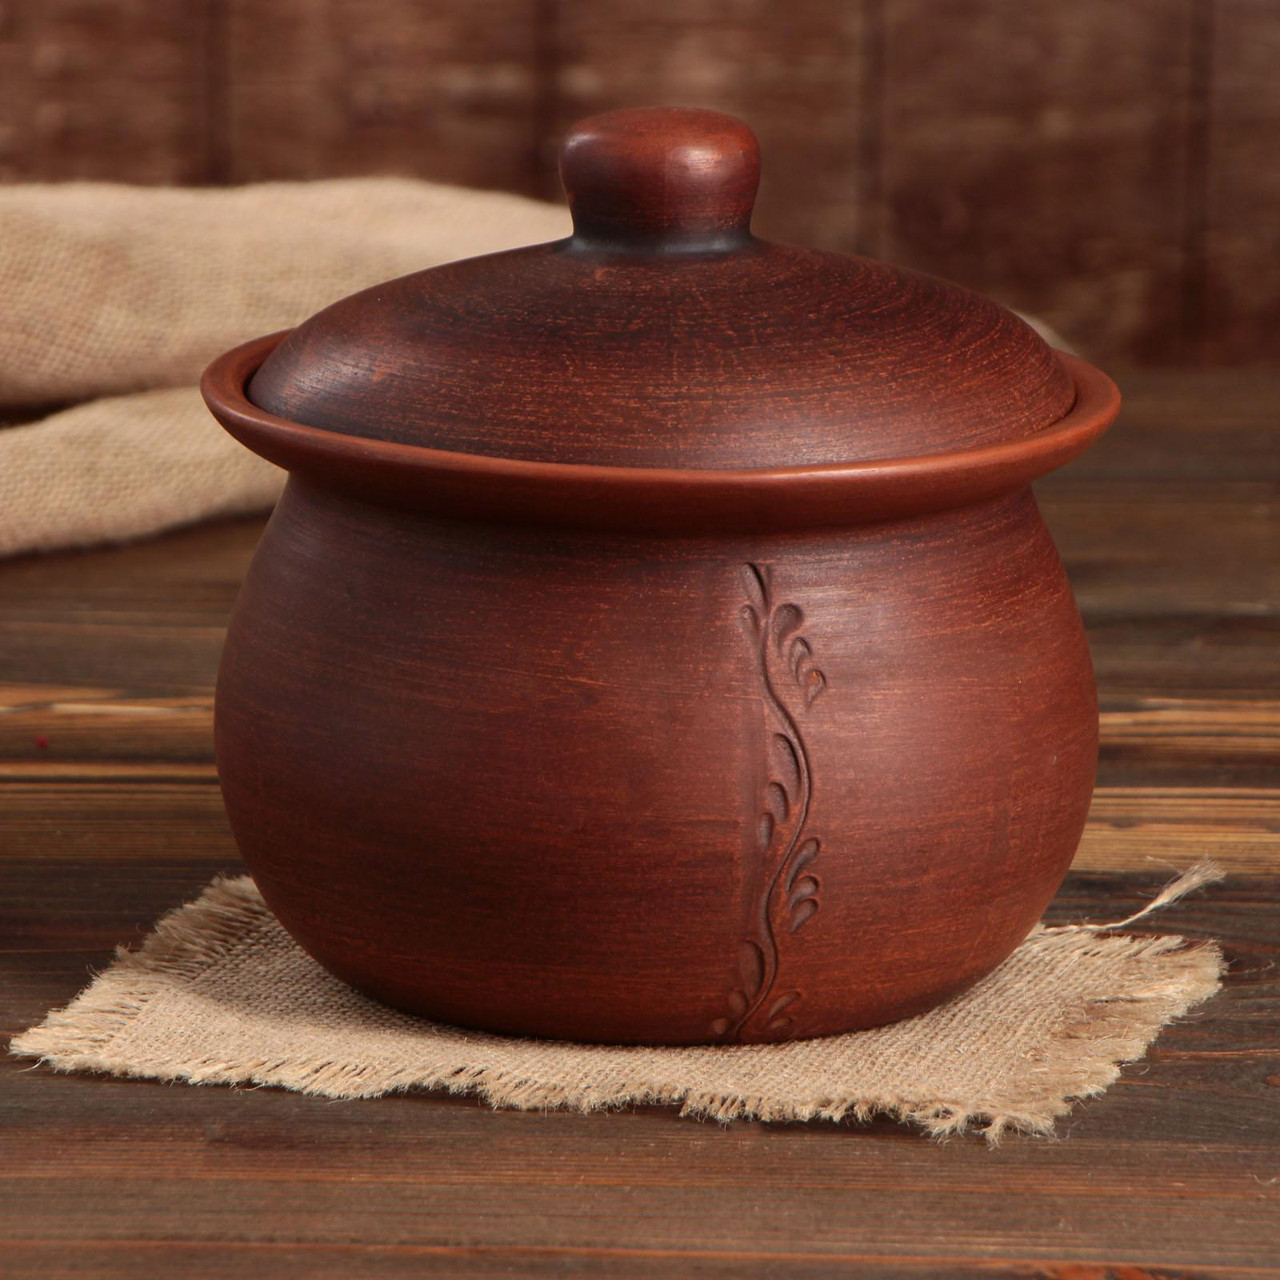 Жаровня духовая «Кашник» красная керамика 3,5 л  (755)